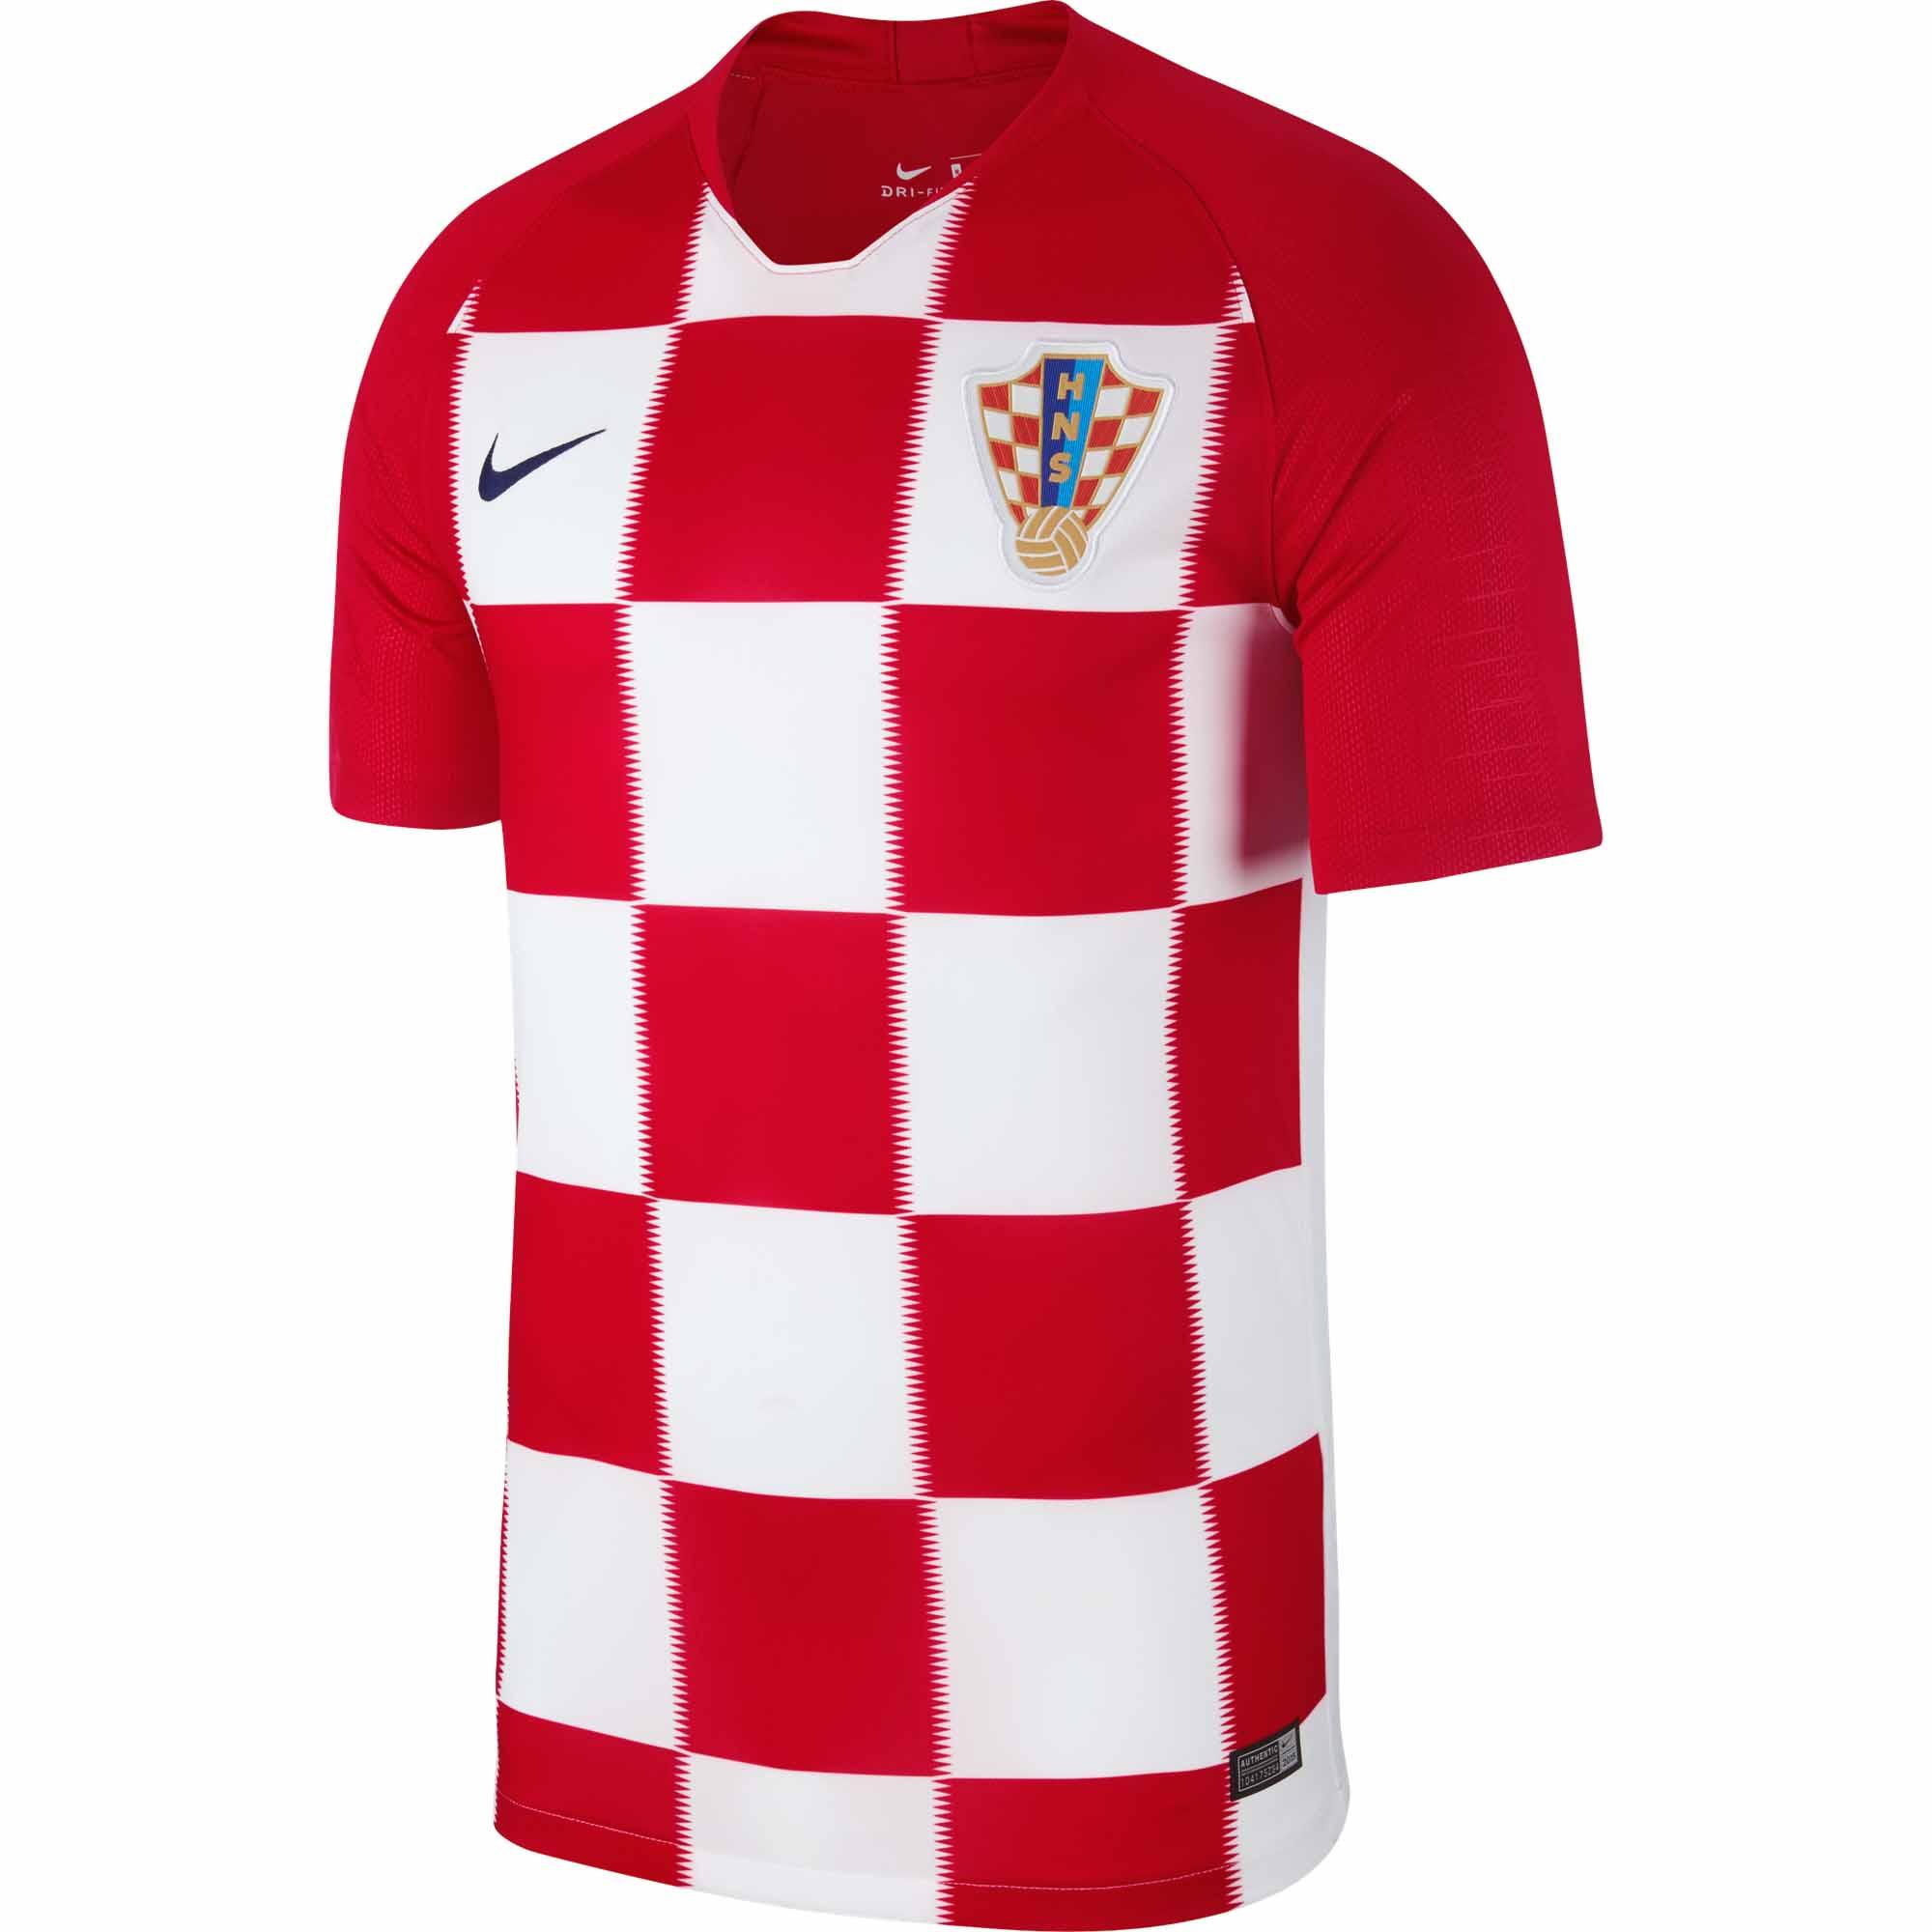 2018/19 Nike Croatia Home Jersey